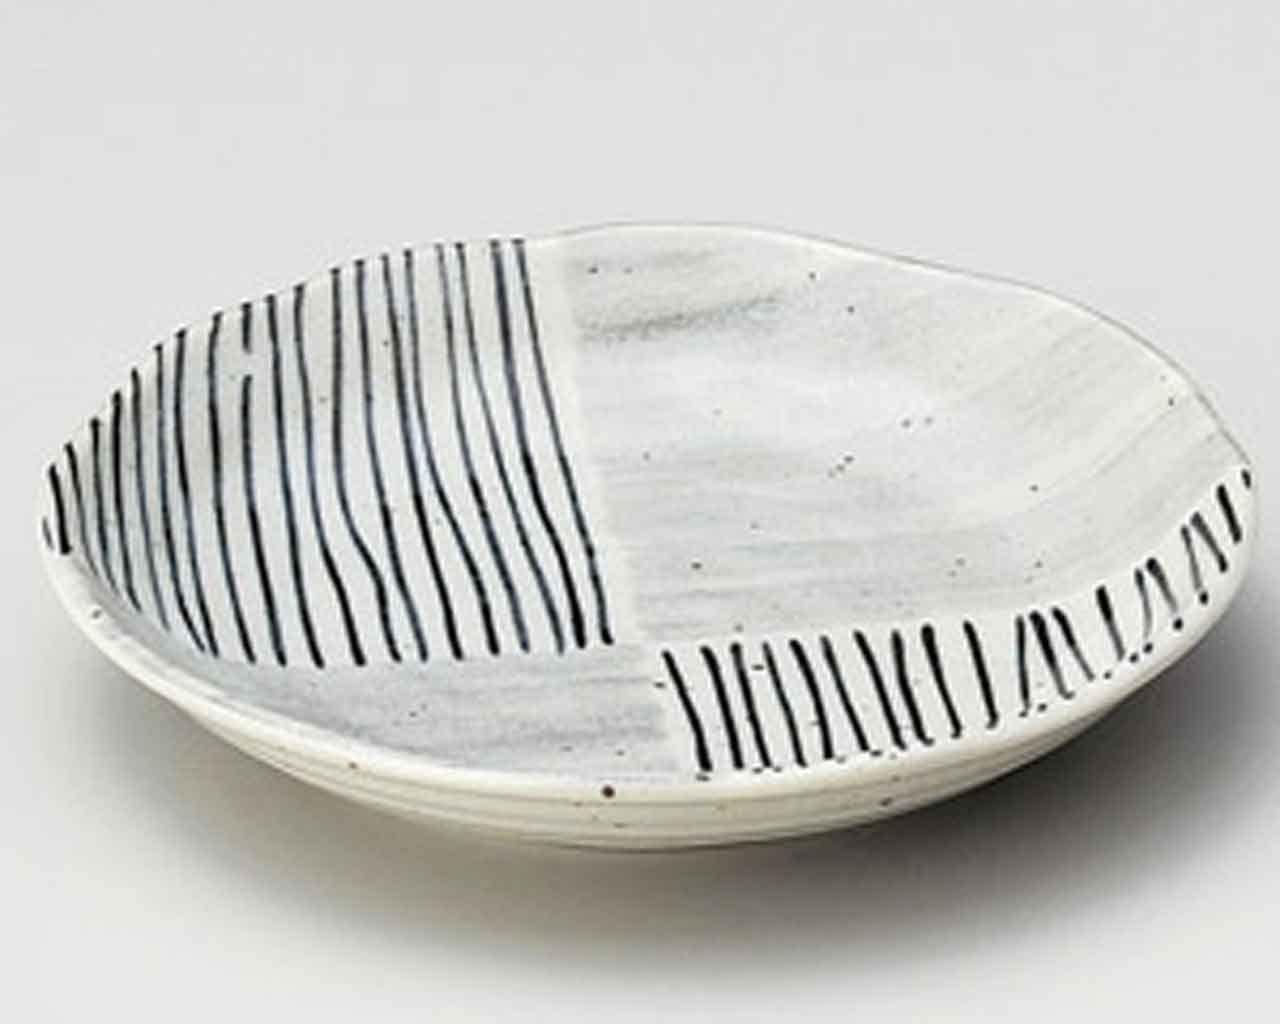 Karatsu Ichimatsu 4.7inch Set of 2 Small Plates Grey porcelain Made in Japan